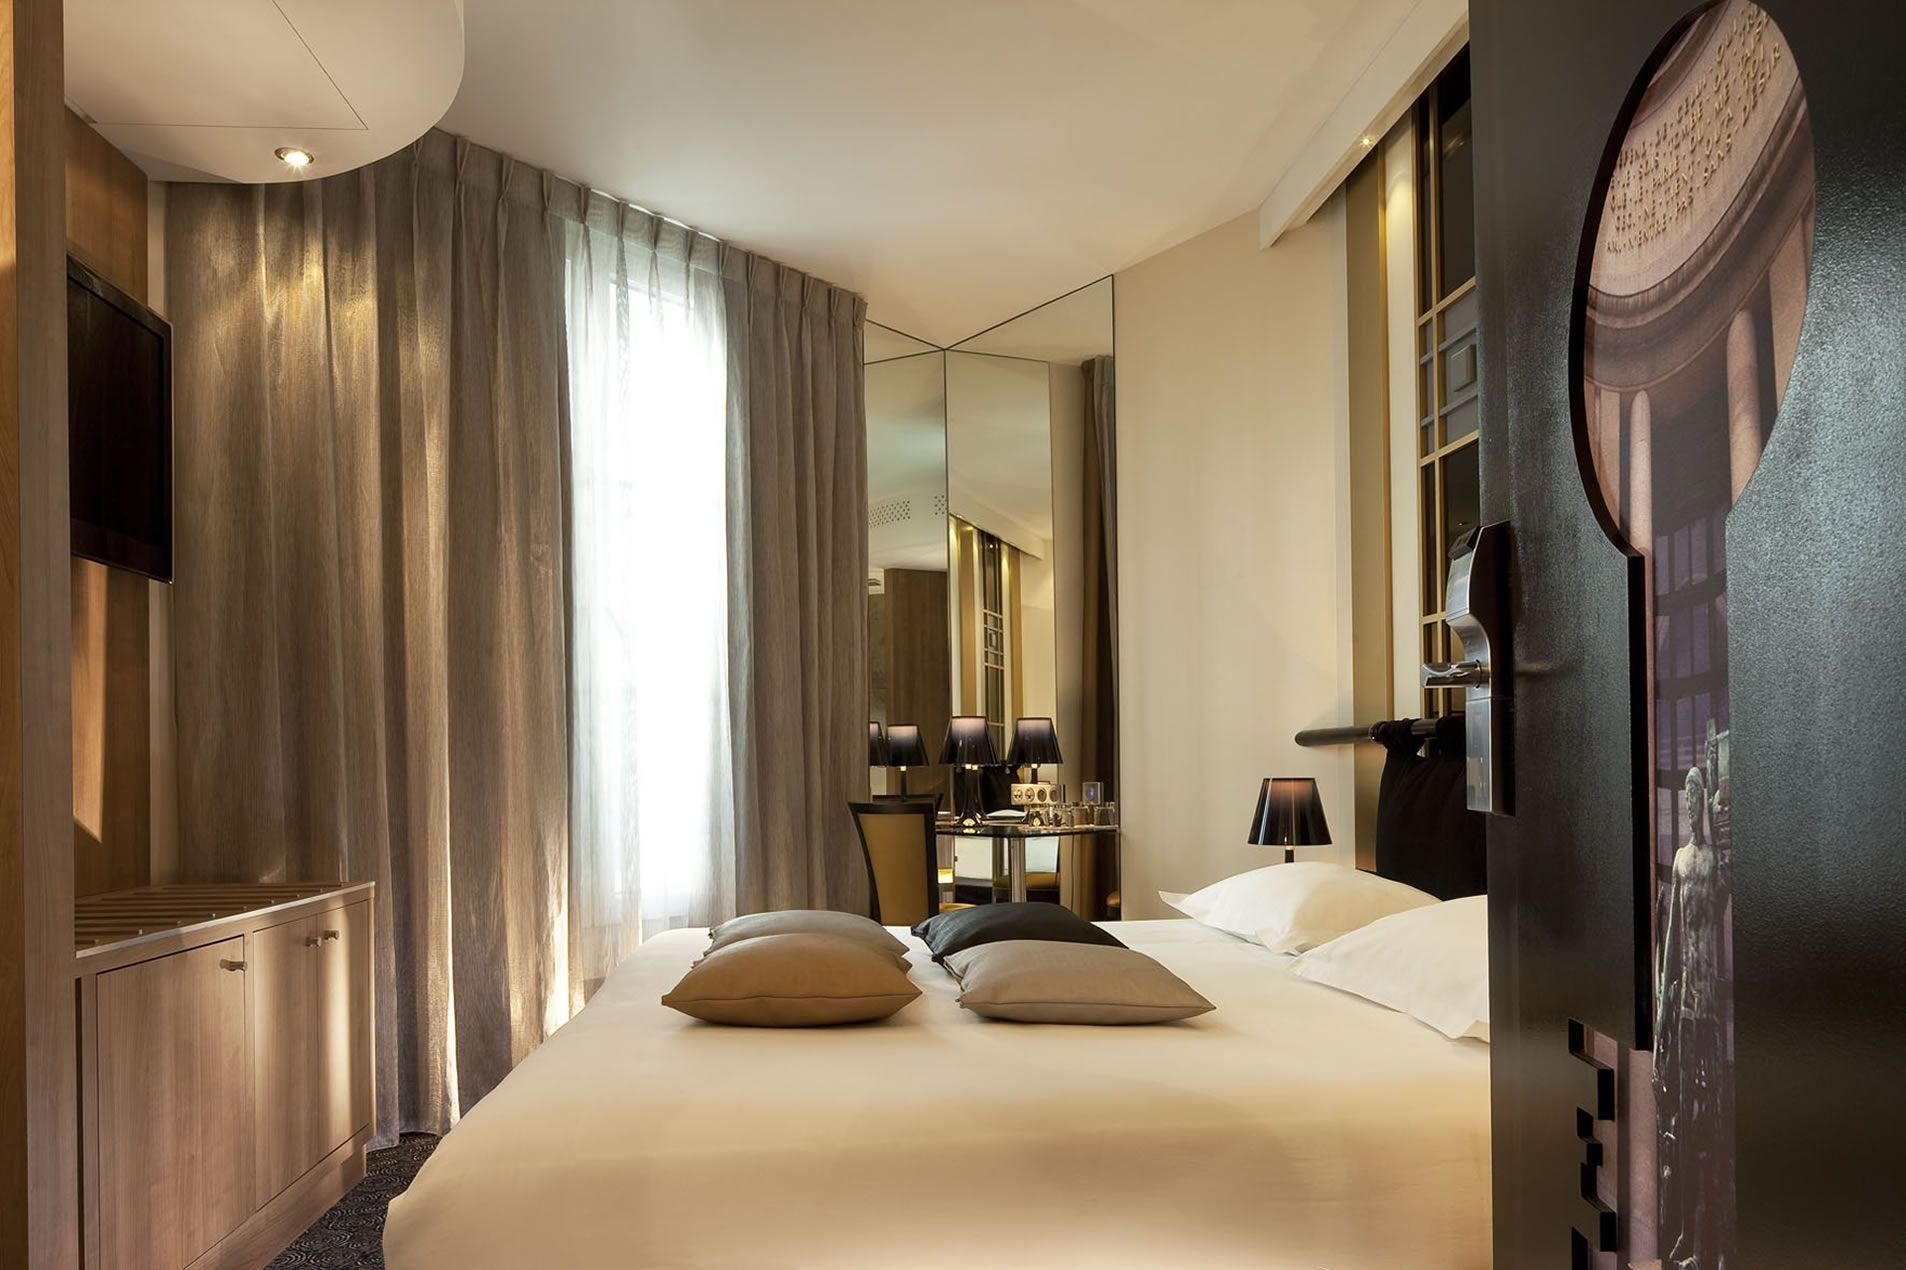 Hôtel Secret de Paris (2009) Design: Sandrine Alouf Atmosphériste #design #hotel